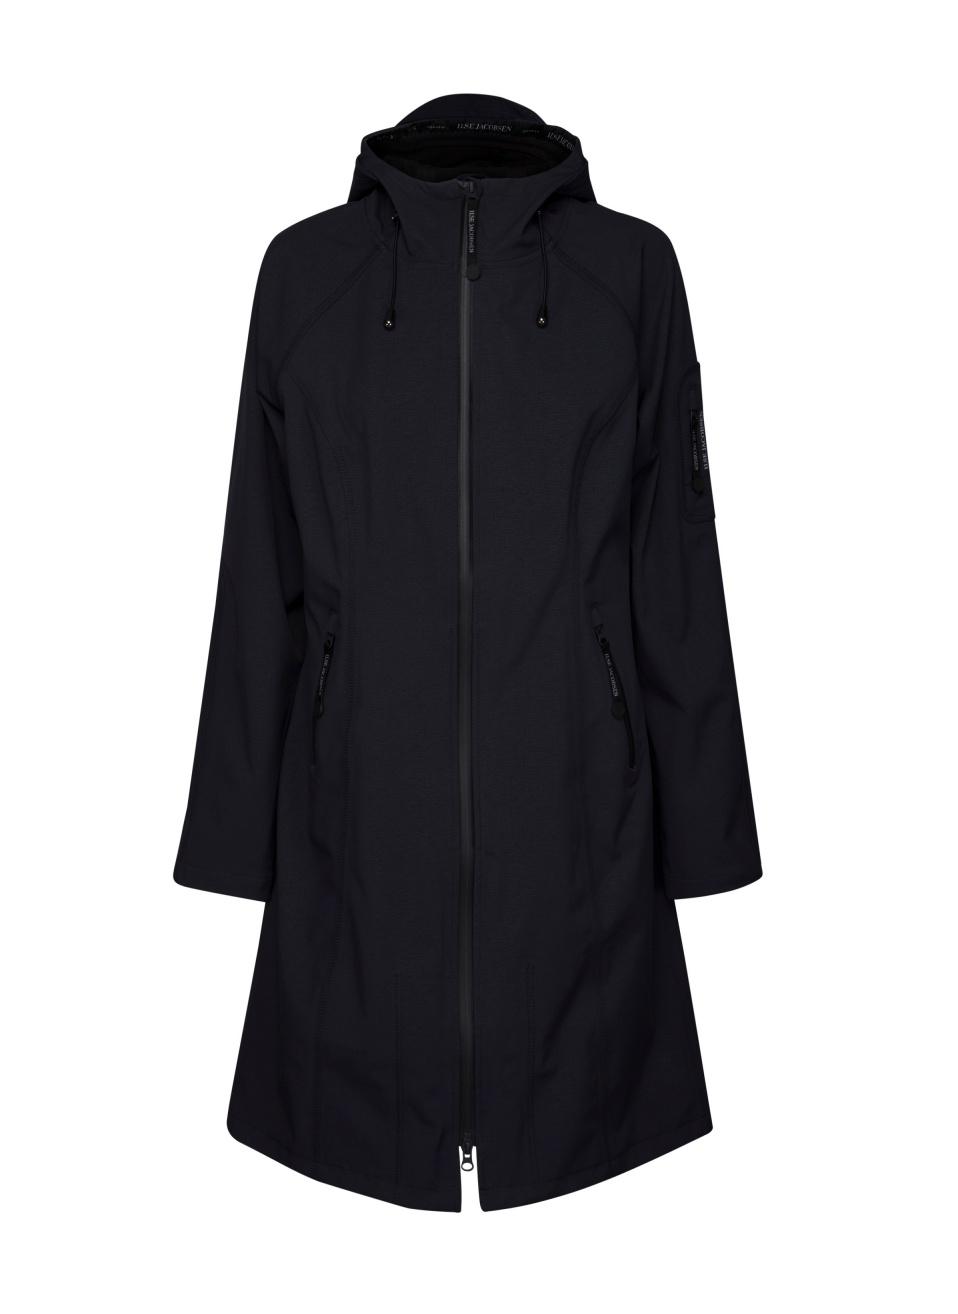 14c73afb866791 Ilse Jacobsen Rain37L Long Soft Shell Raincoat